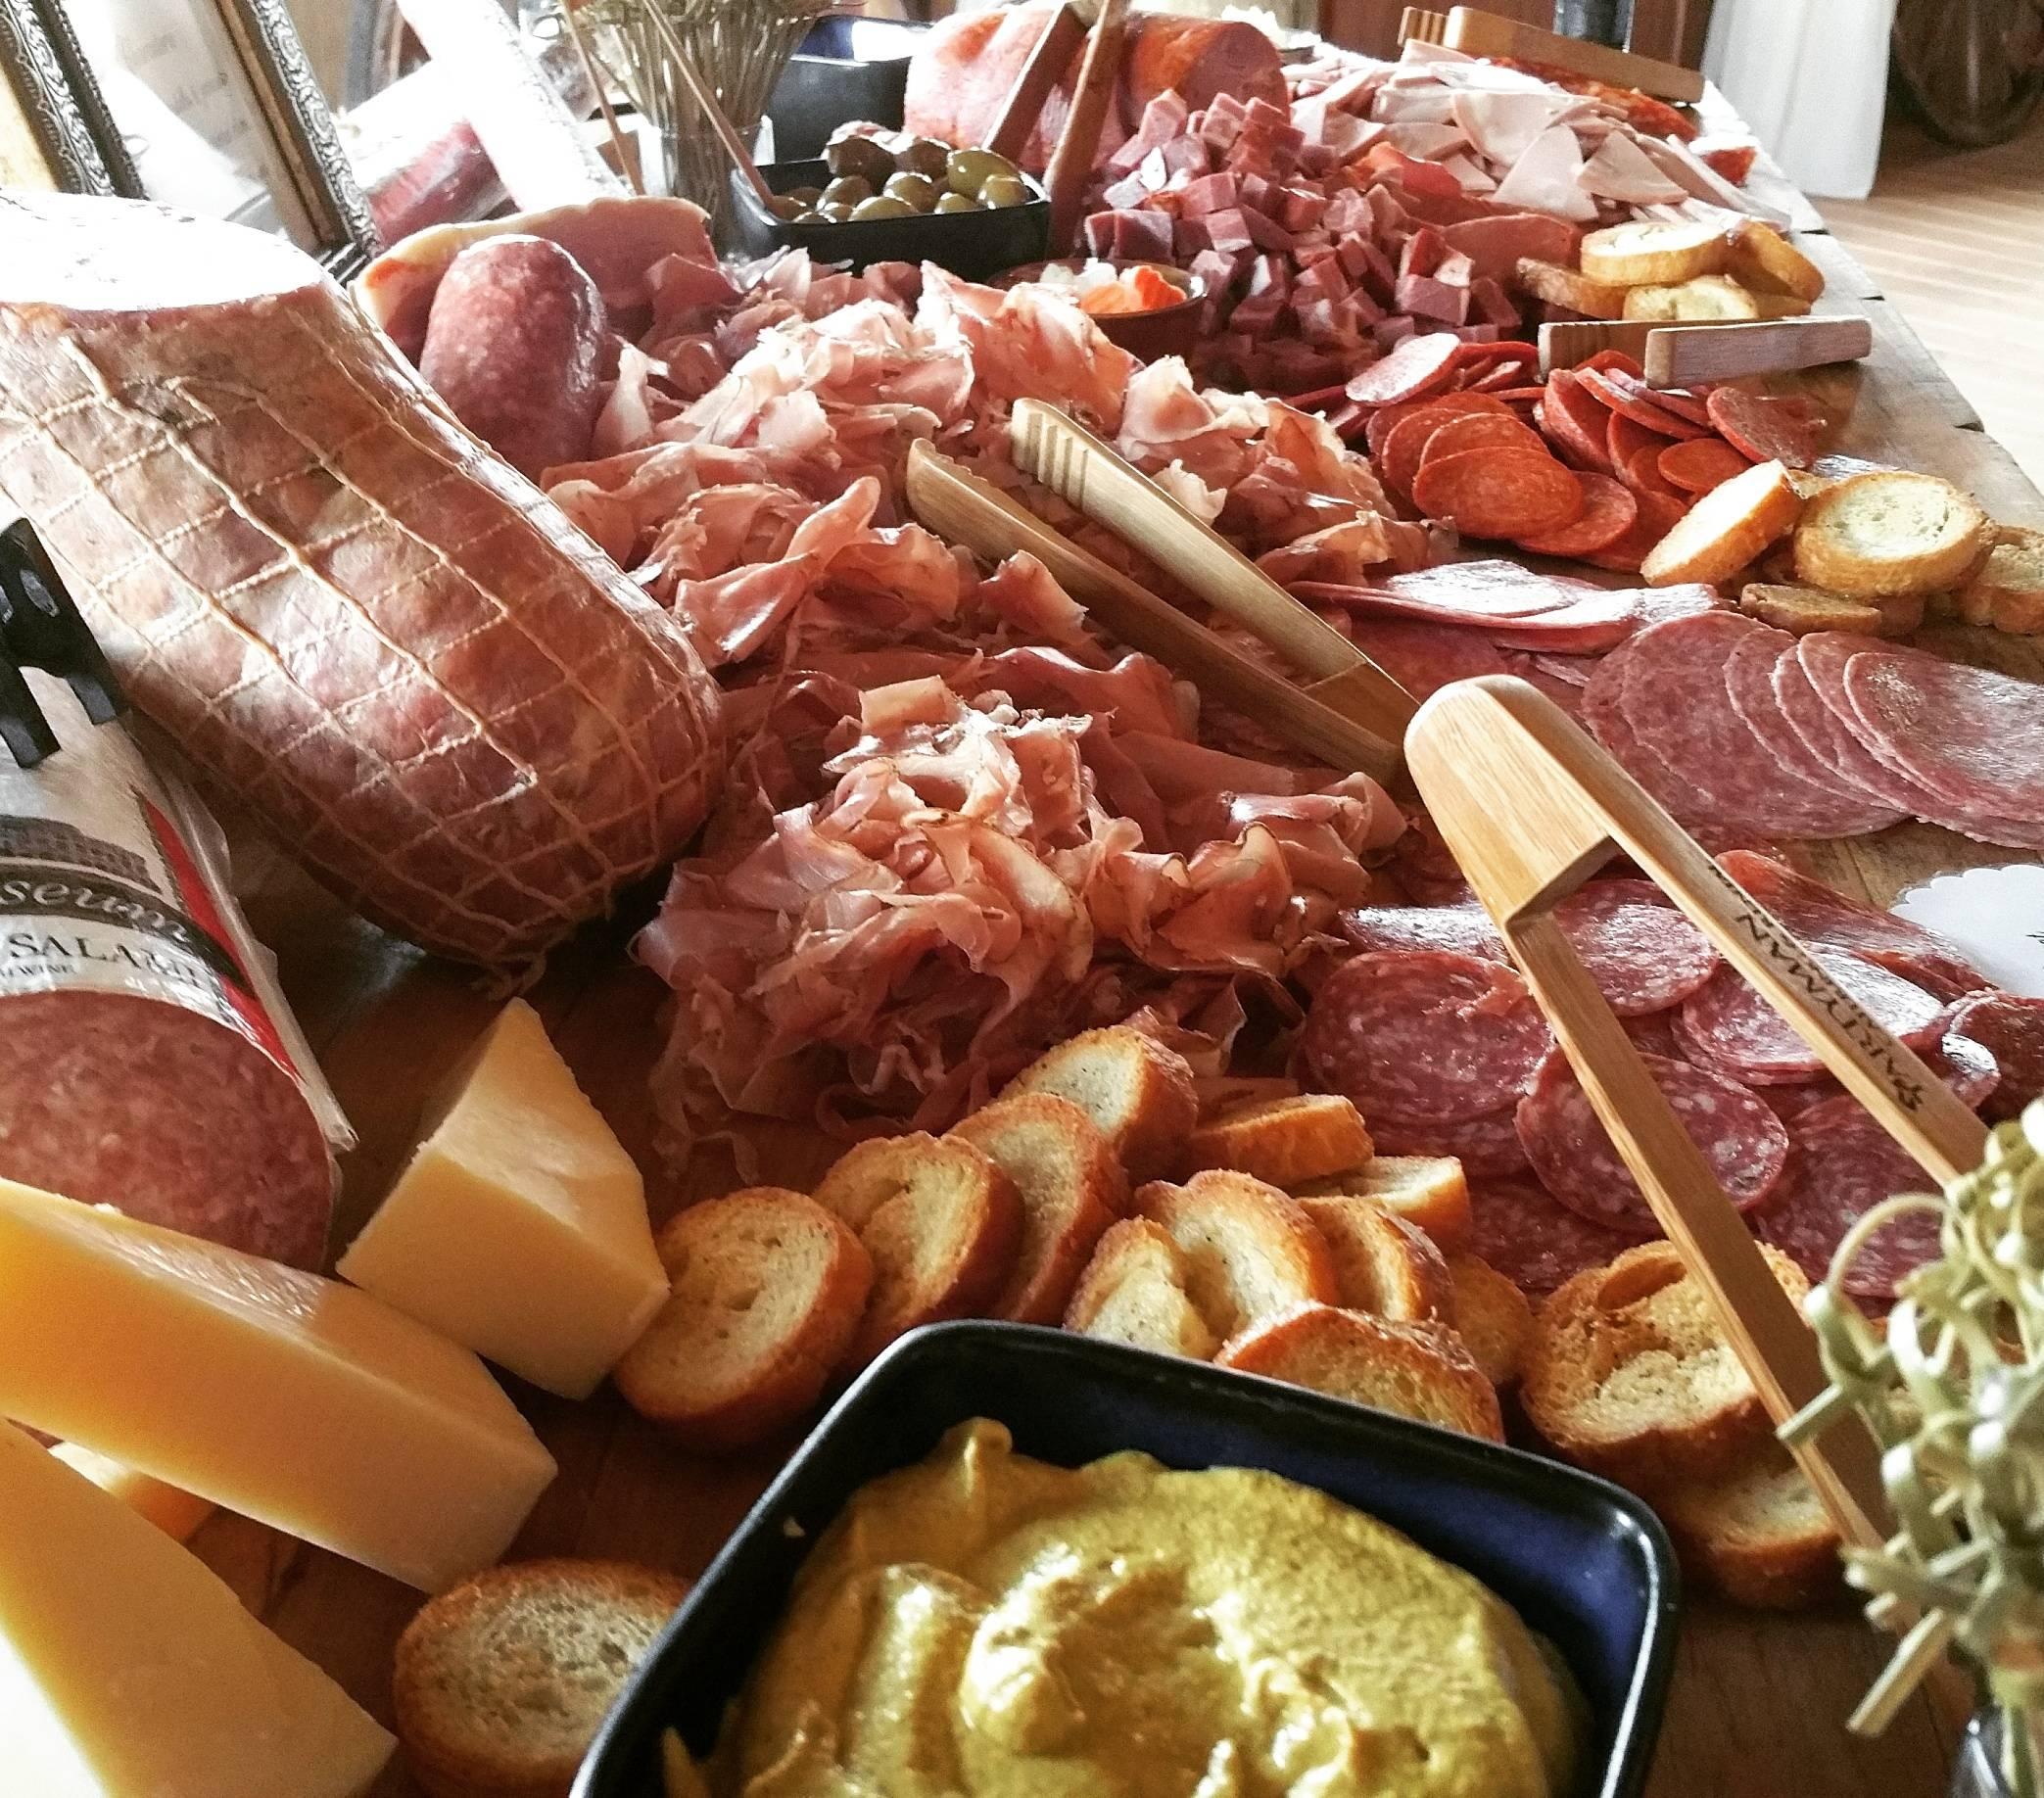 Huge Meat Charcuterie Spread